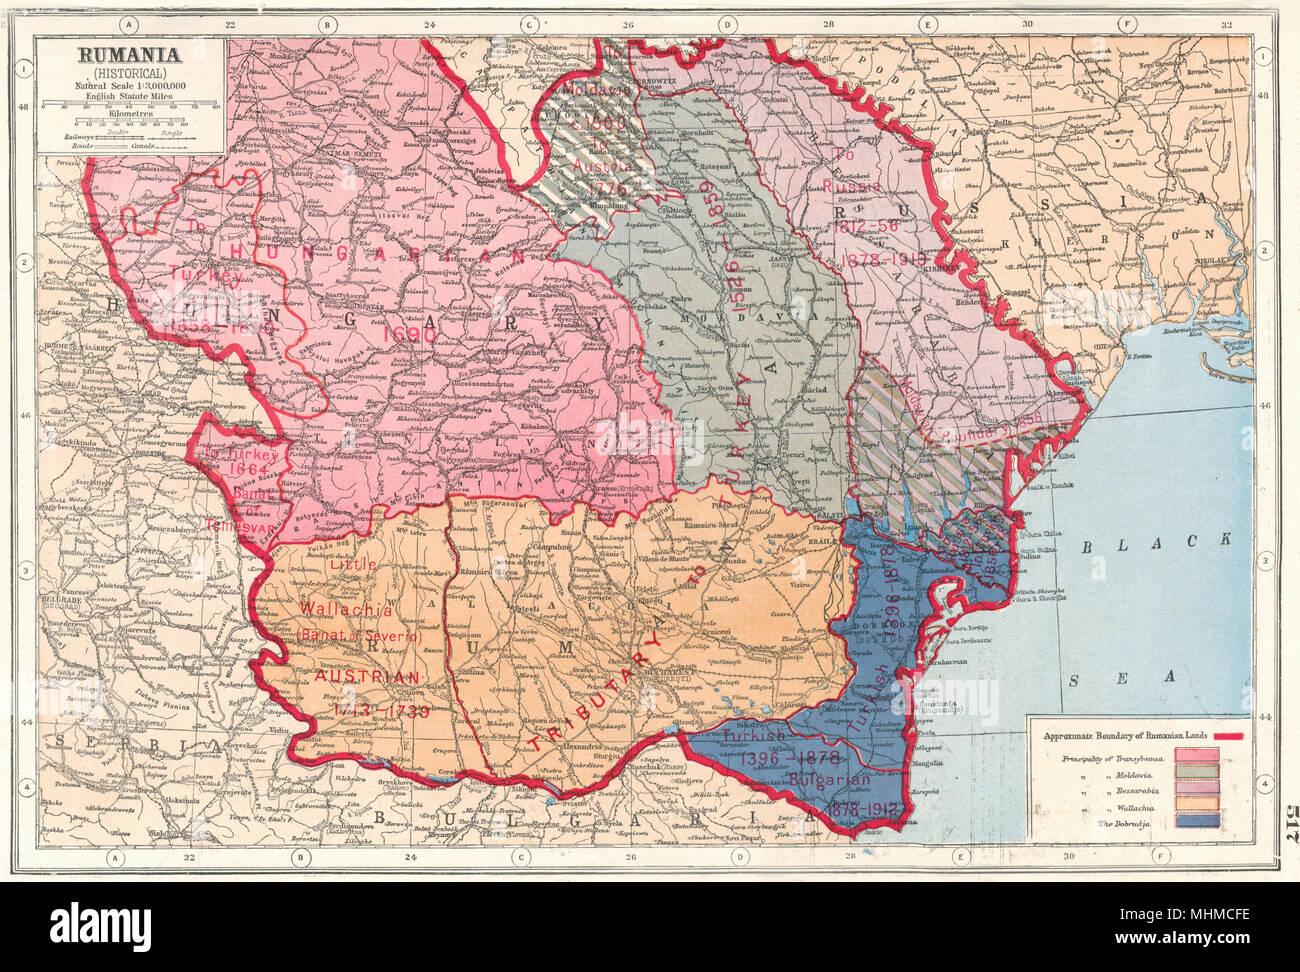 Cartina Geografica Romania Transilvania.La Romania Storica Transilvania Bessarabia Valacchia Moldavia Dobrudja 1920 Mappa Foto Stock Alamy